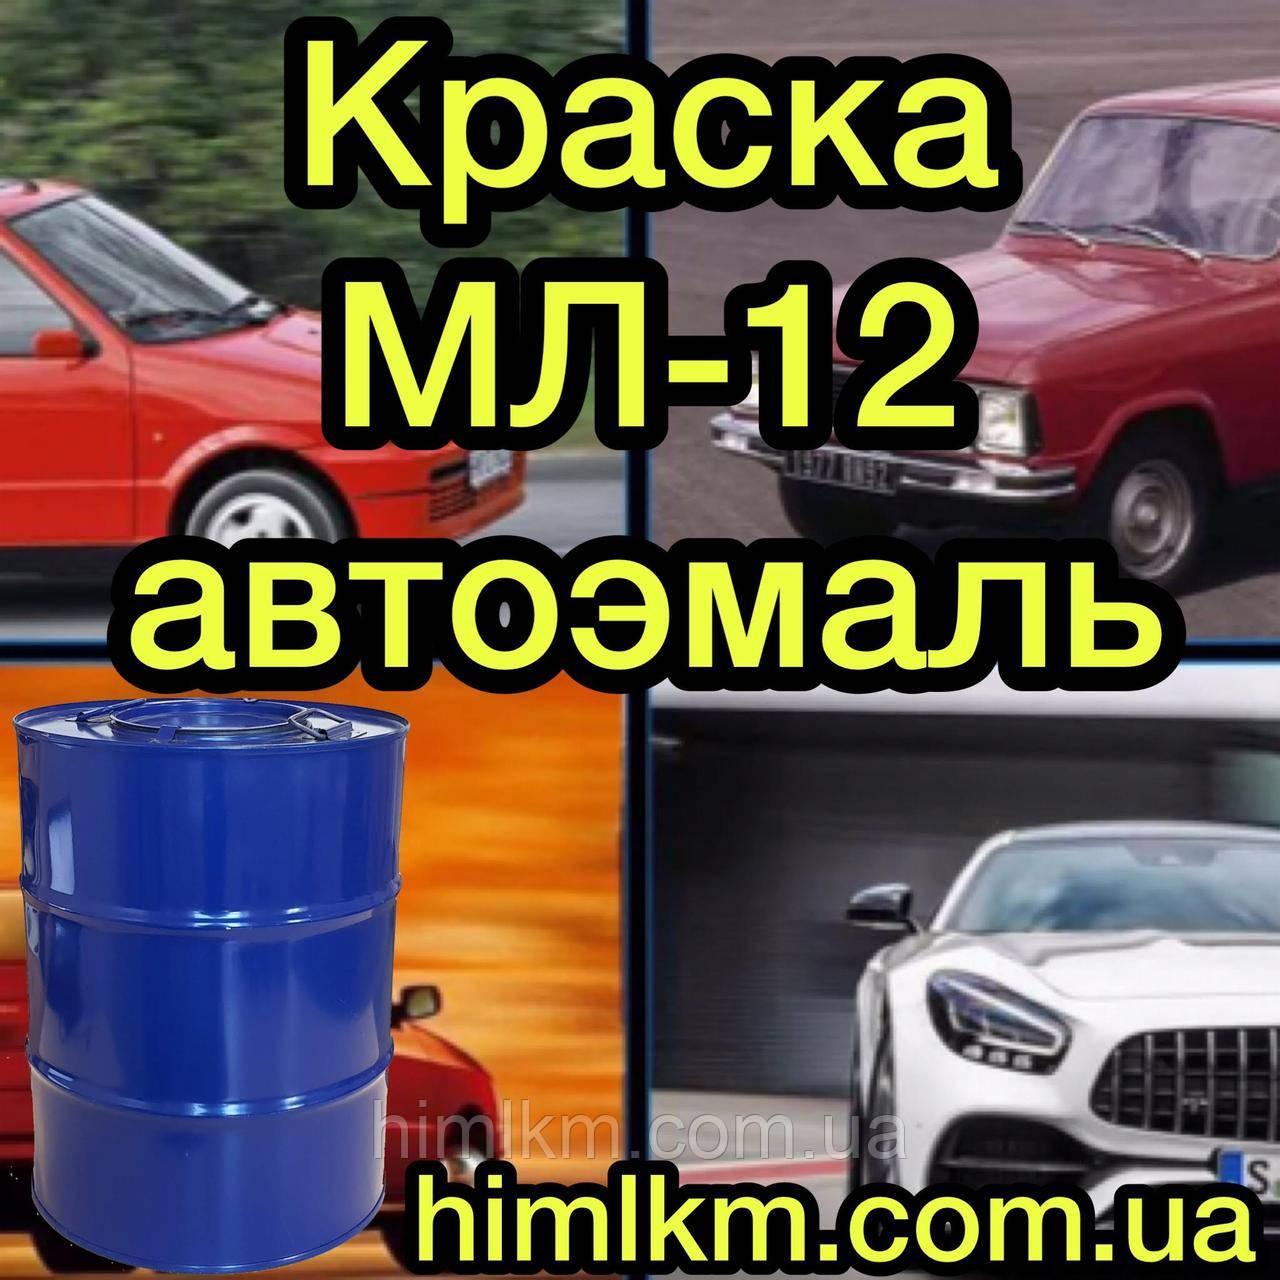 Краска автомобильная МЛ-12 Эмаль МЛ-12 автокраска  Автоэмаль МЛ-12, 50кг